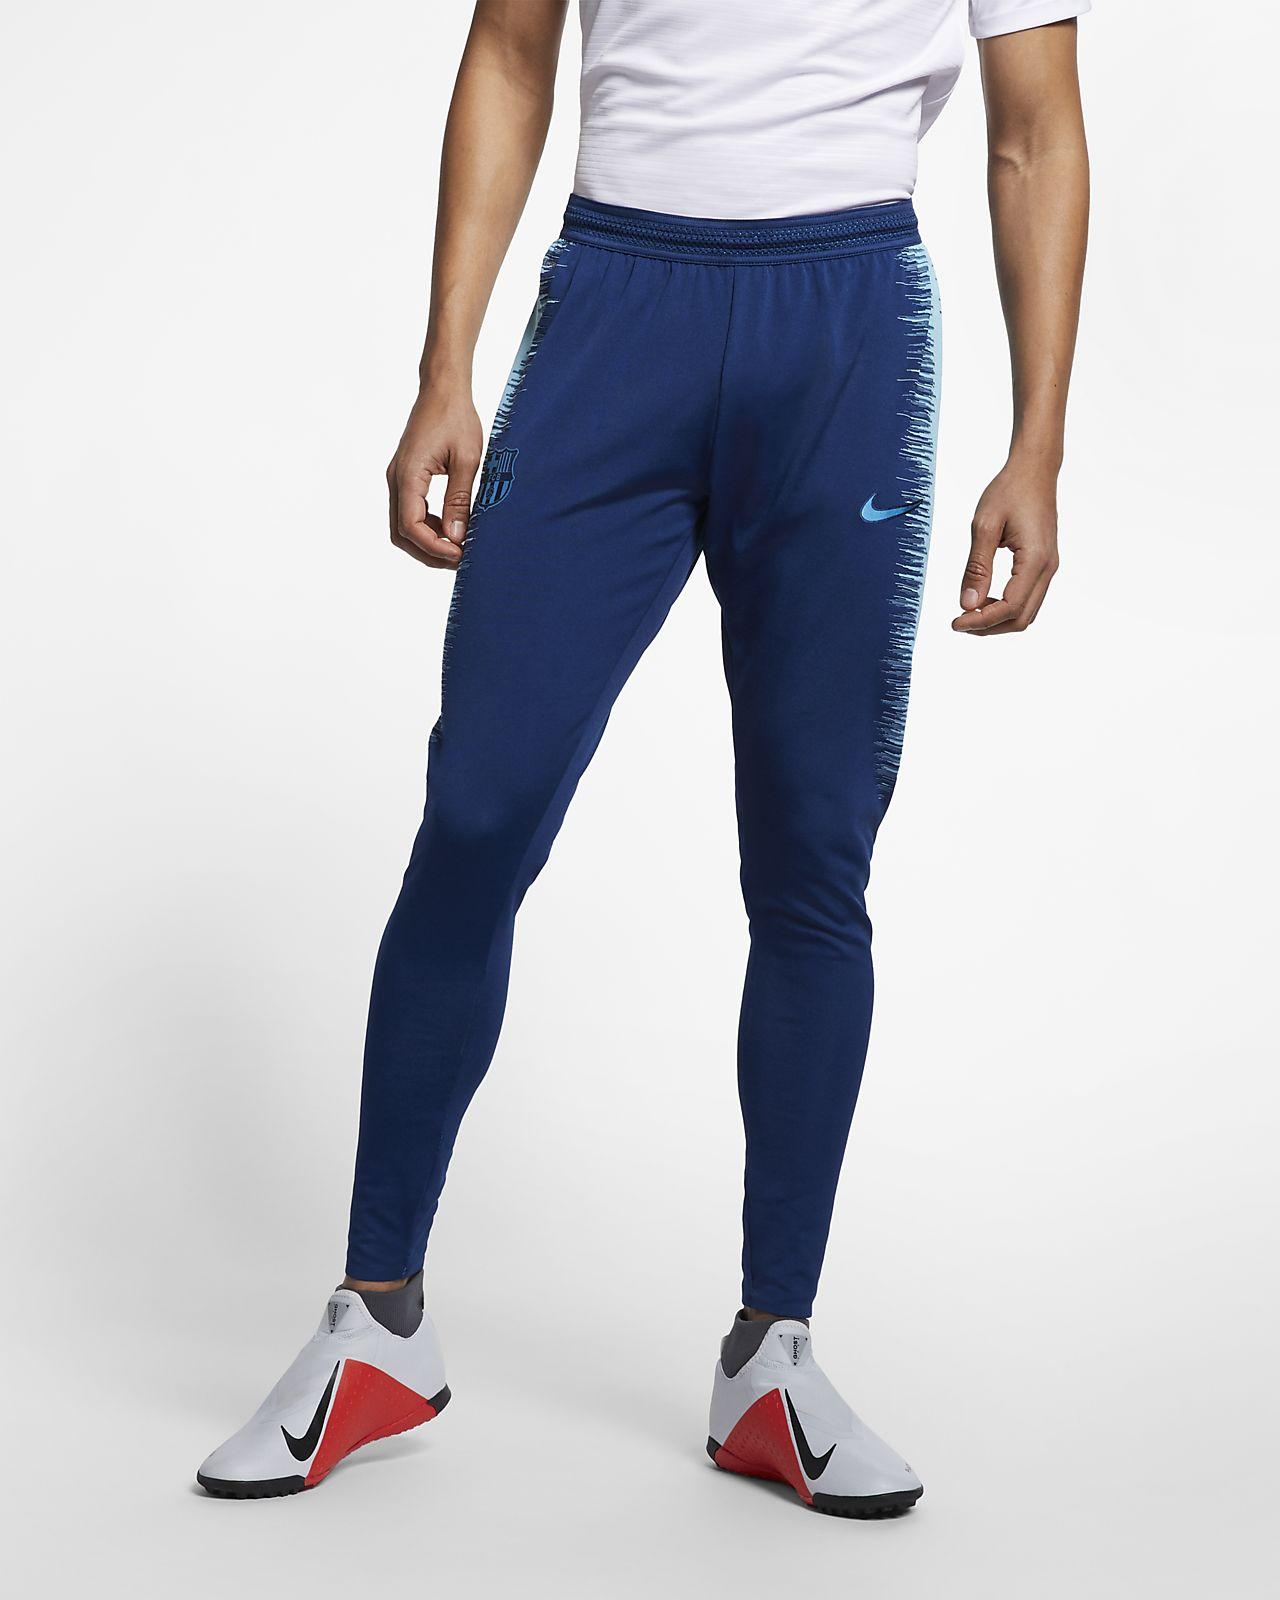 3e460c53598a0 Pantalon de football FC Barcelona VaporKnit Strike pour Homme. Nike ...